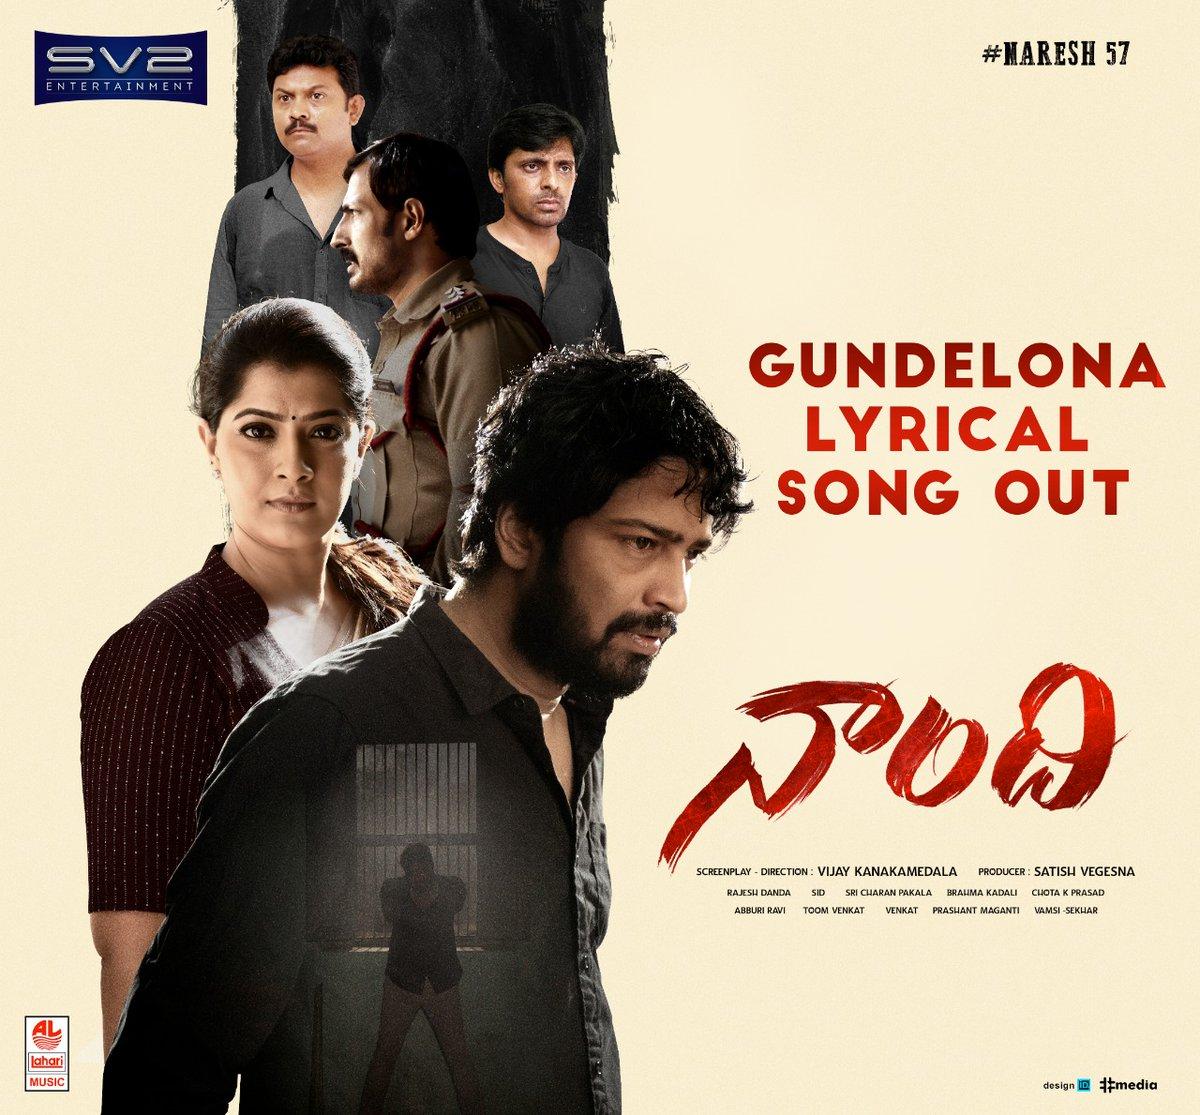 "The emotional song ""Gundelona"" from #Naandhi is here!  👉    Experience the #BlockbusterJustice ⚖️ Naandhi in your nearest theatres.   @allarinaresh @vijaykkrishna @SatishVegesna @varusarath5 @SricharanPakala #Kareemulla @ChotaKPrasad @SV2Ent"